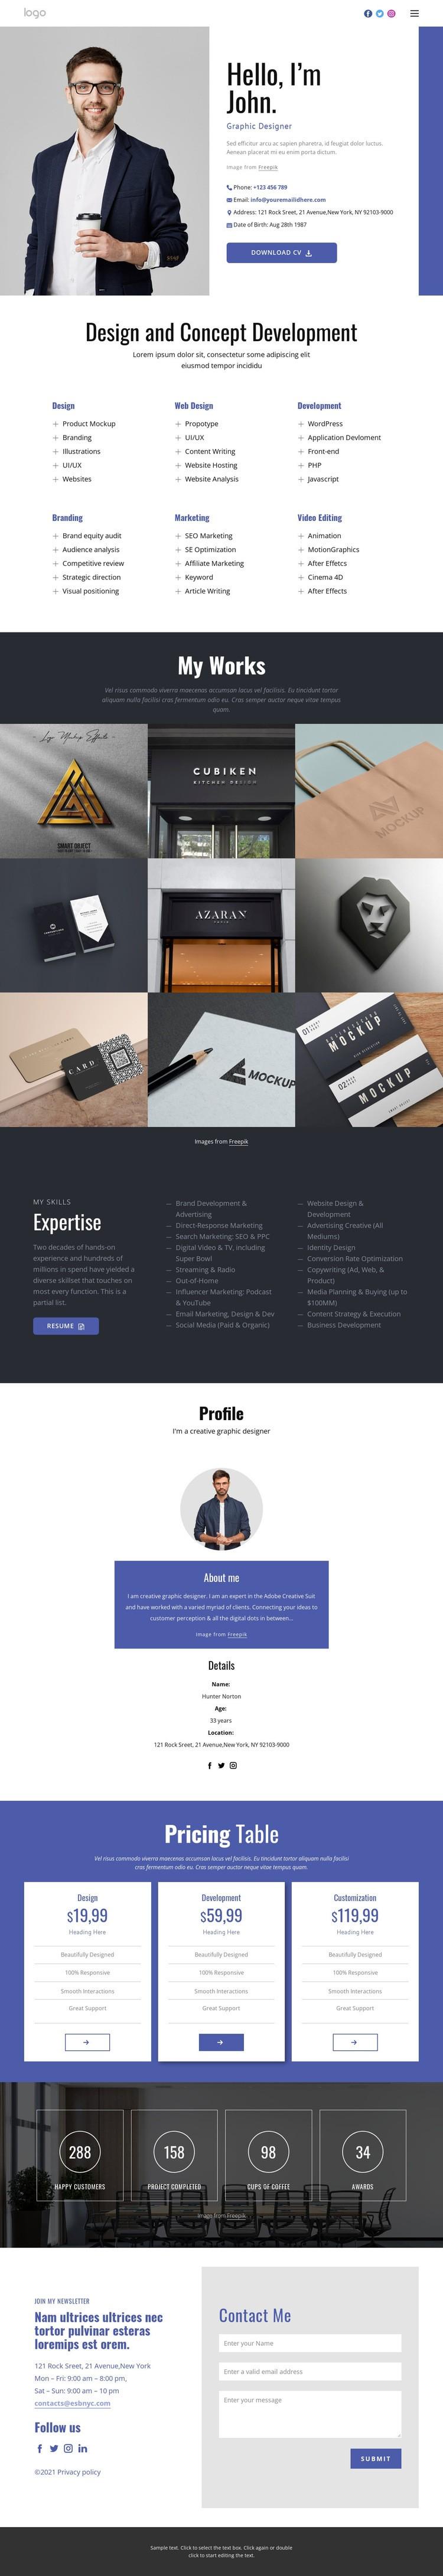 Conceptual design Web Page Designer